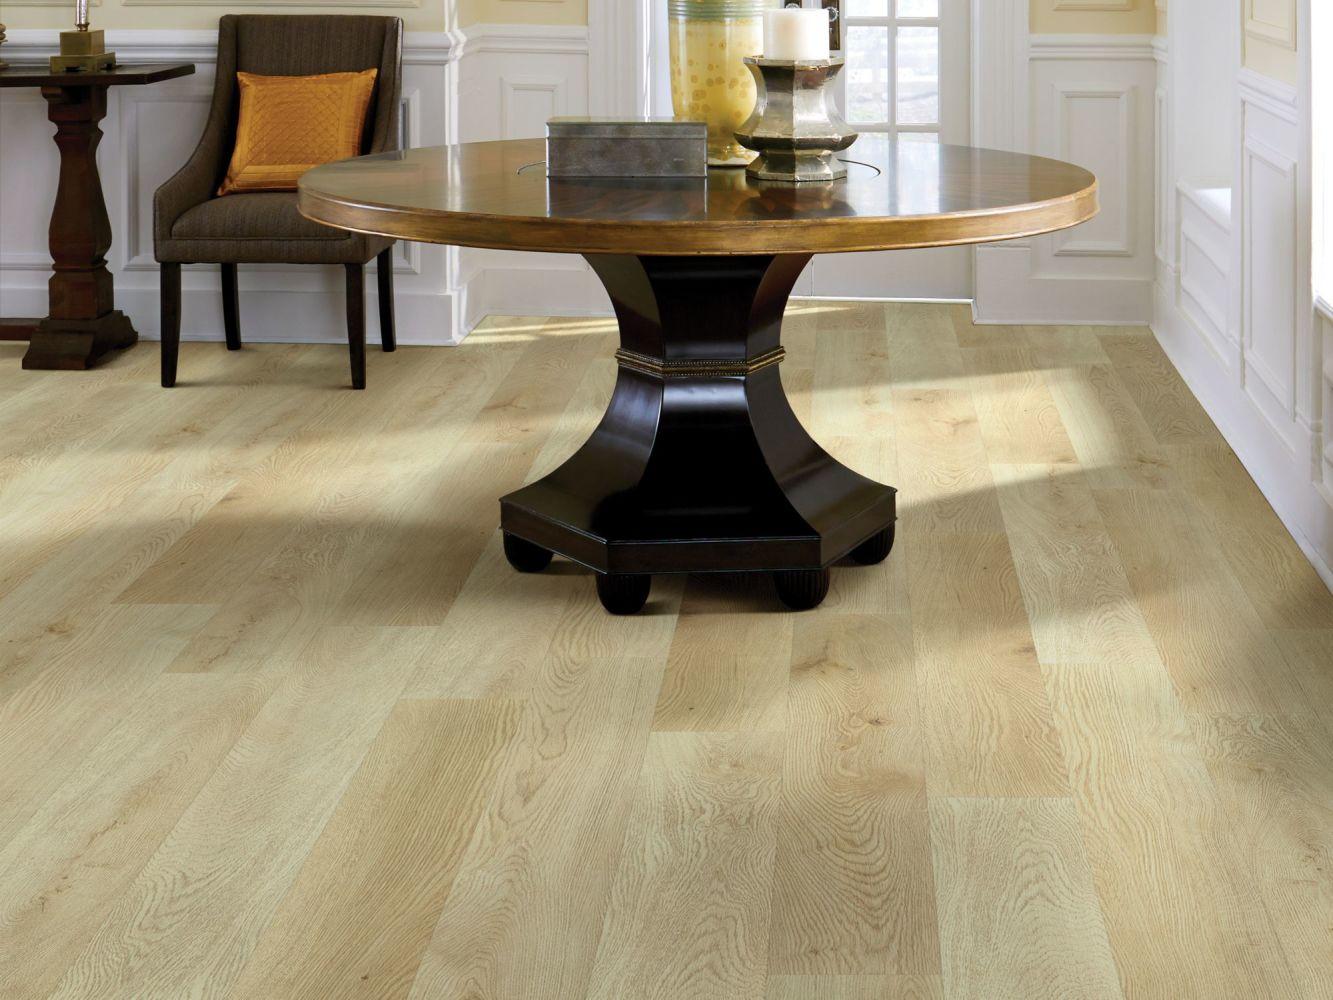 Shaw Floors Setup River Bend Oak 00296_5M402